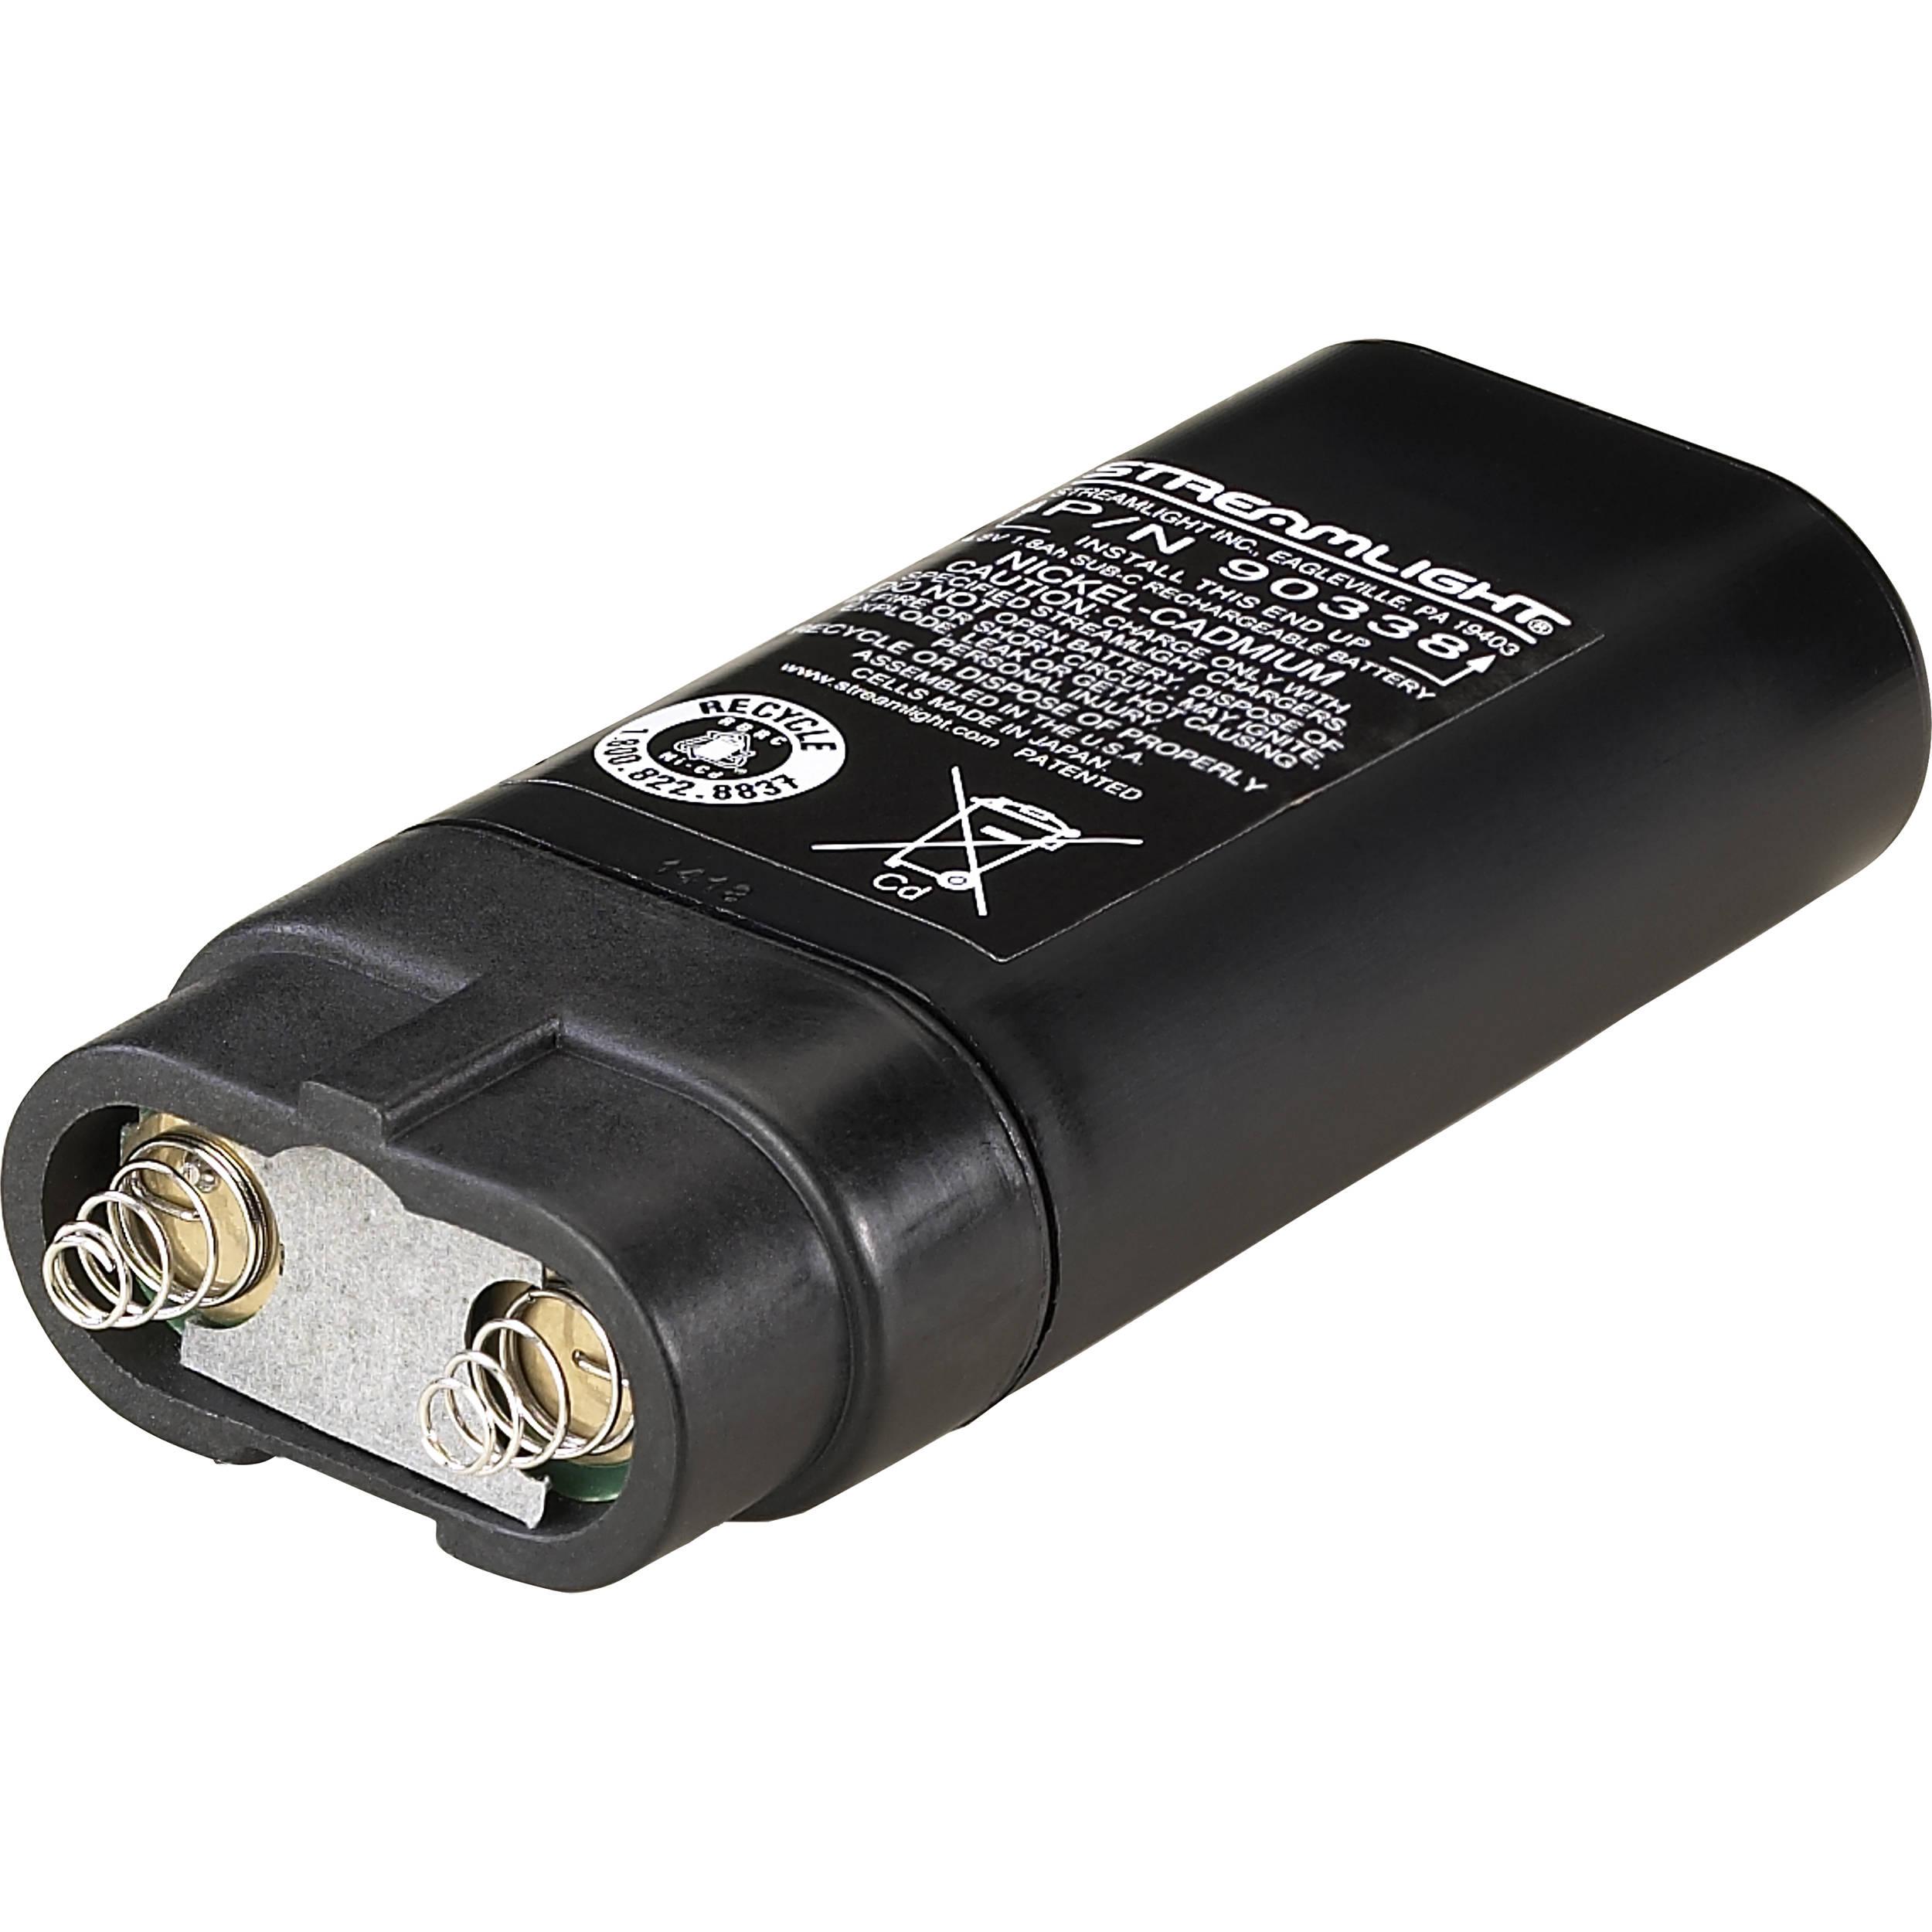 6bd1b0ea518b20 streamlight_90338_battery_pack_assembly_nicd_1408967.jpg